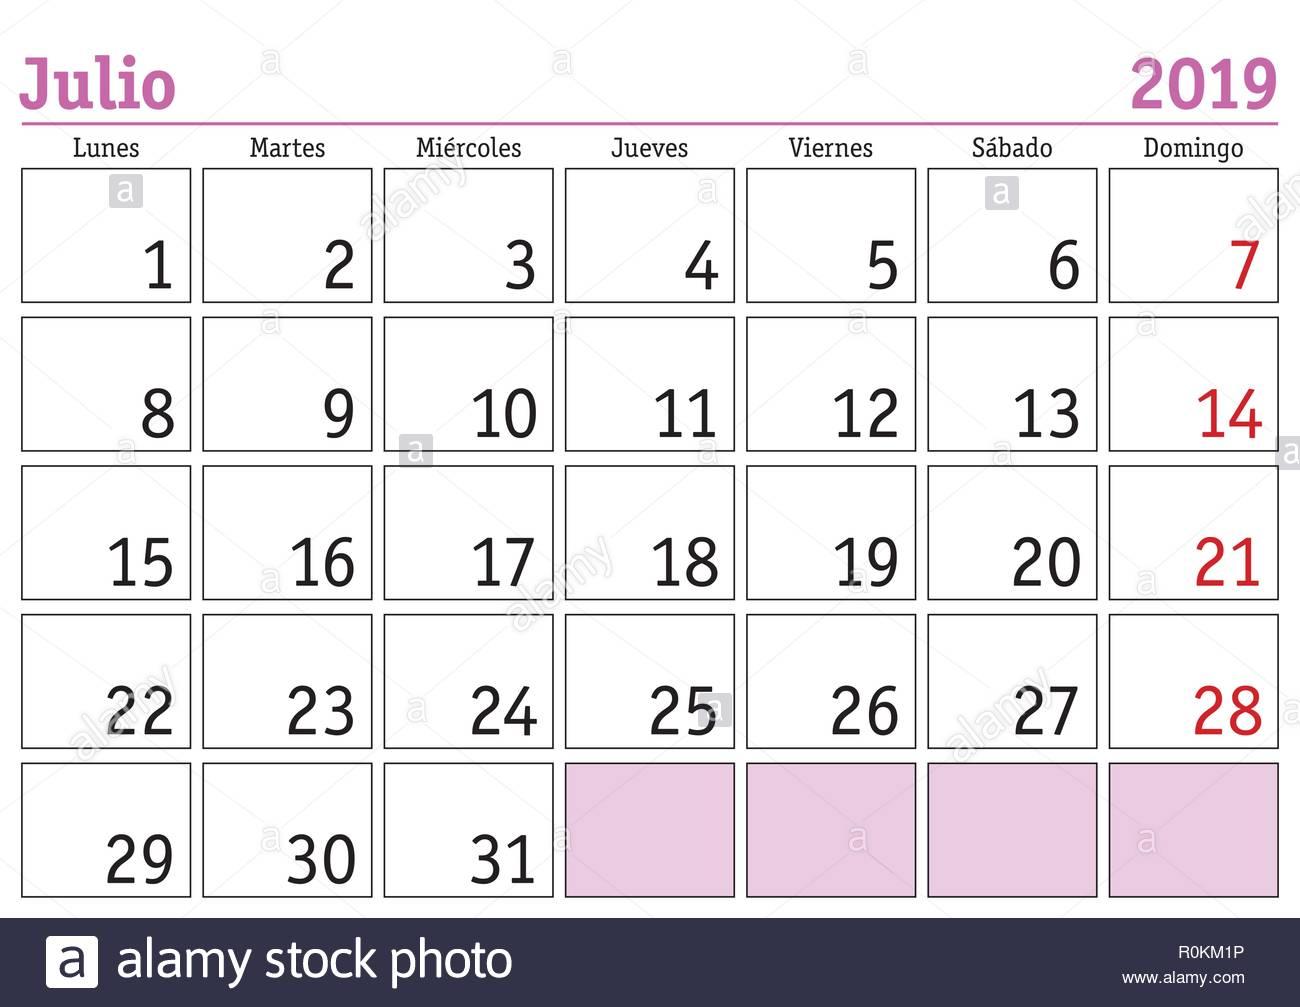 Julio Calendario 2019.July Month In A Year 2019 Wall Calendar In Spanish Julio 2019